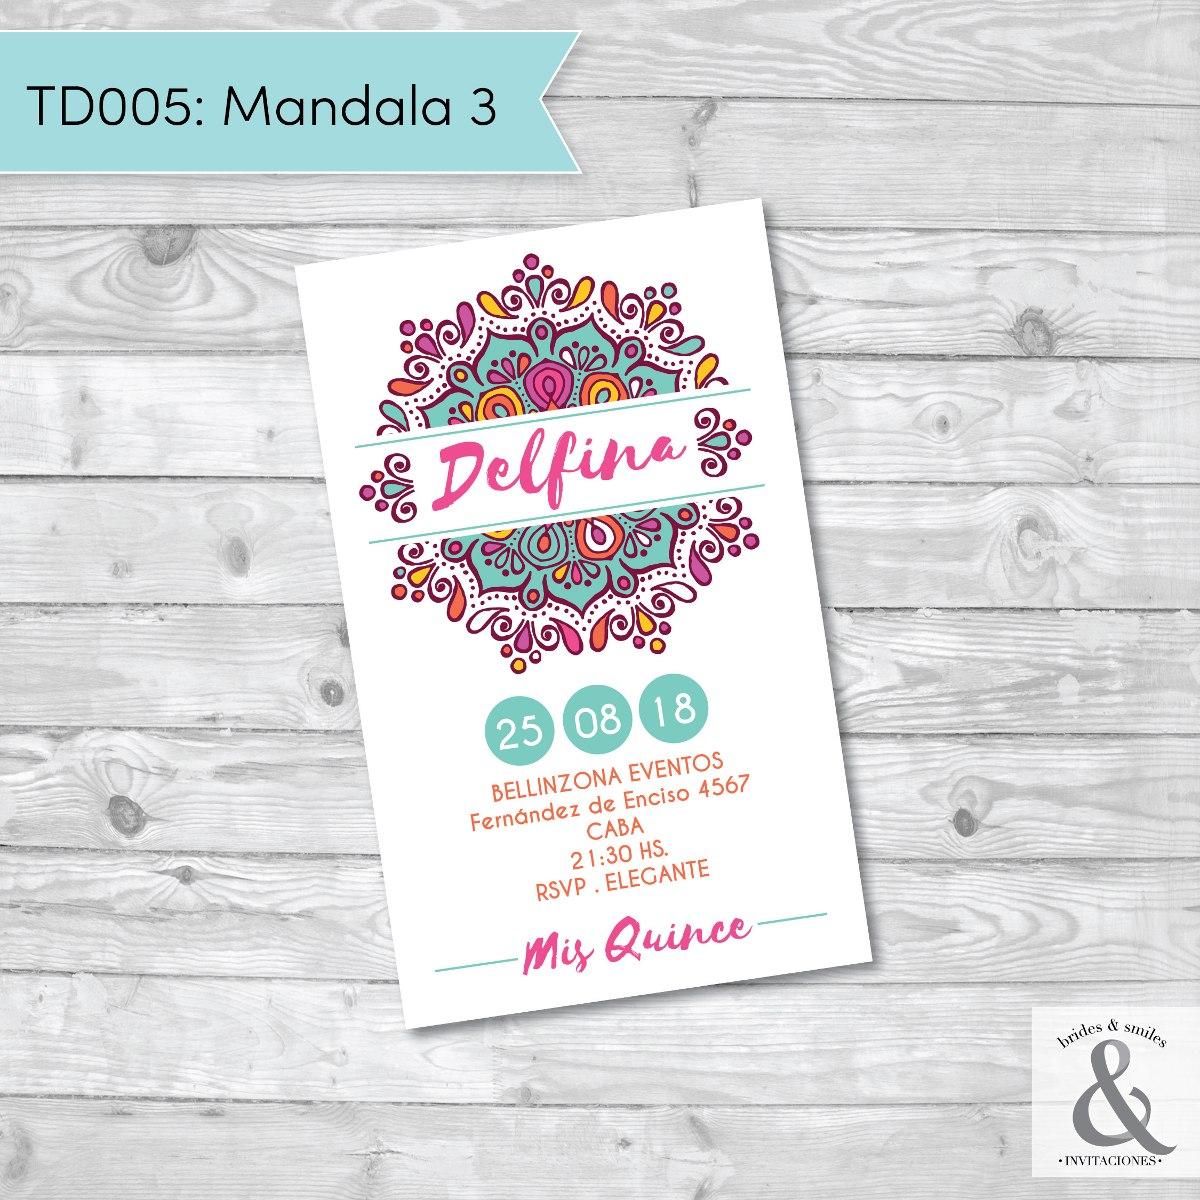 Invitación digital TD005 (Mandala 3)